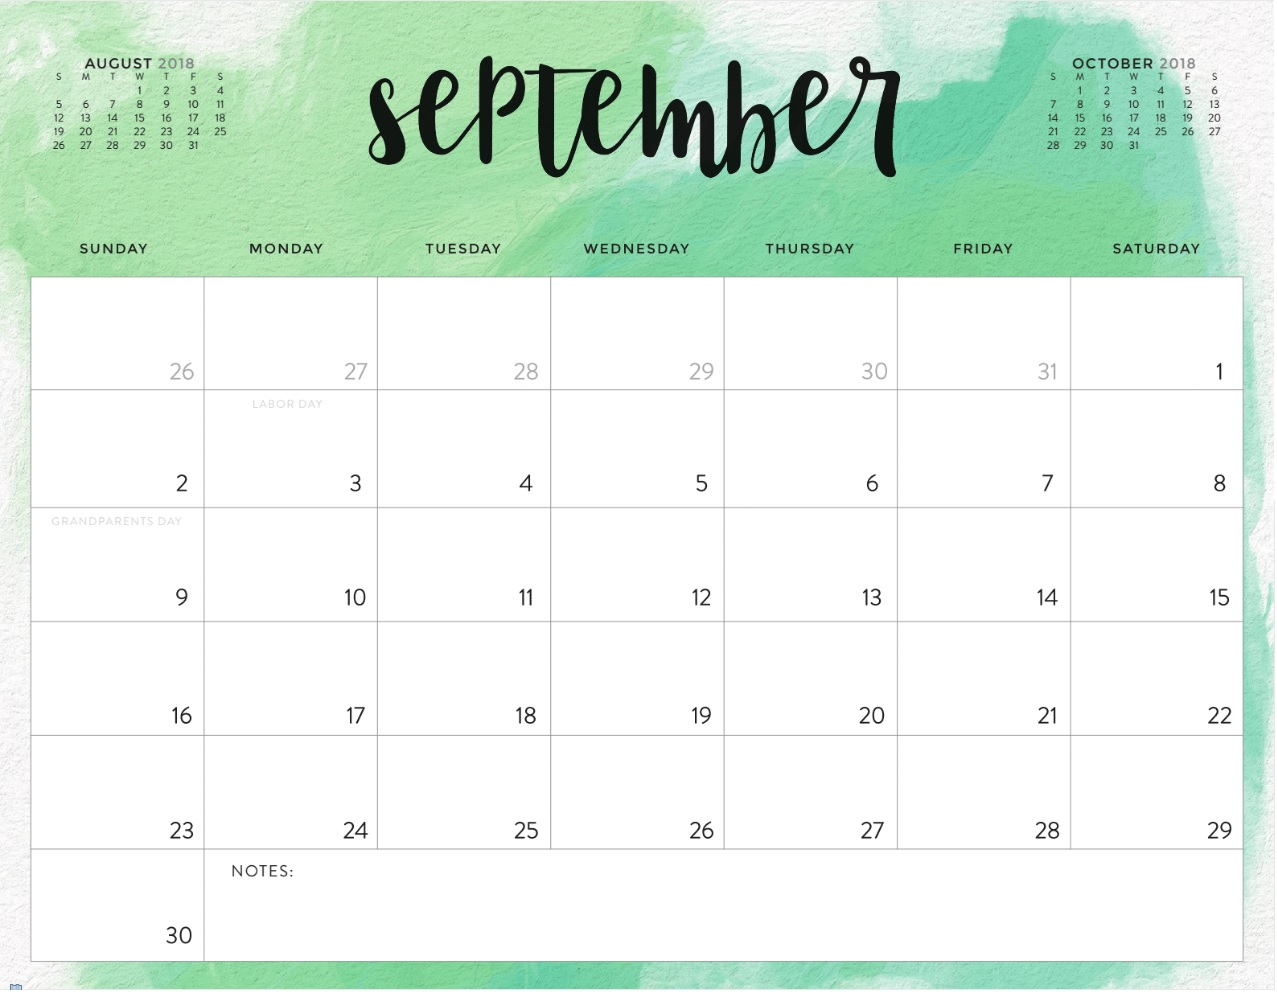 September 2018 Printable Calendar Word Template- September 2018 inside Free Printable Calendars 2020 Waterproof